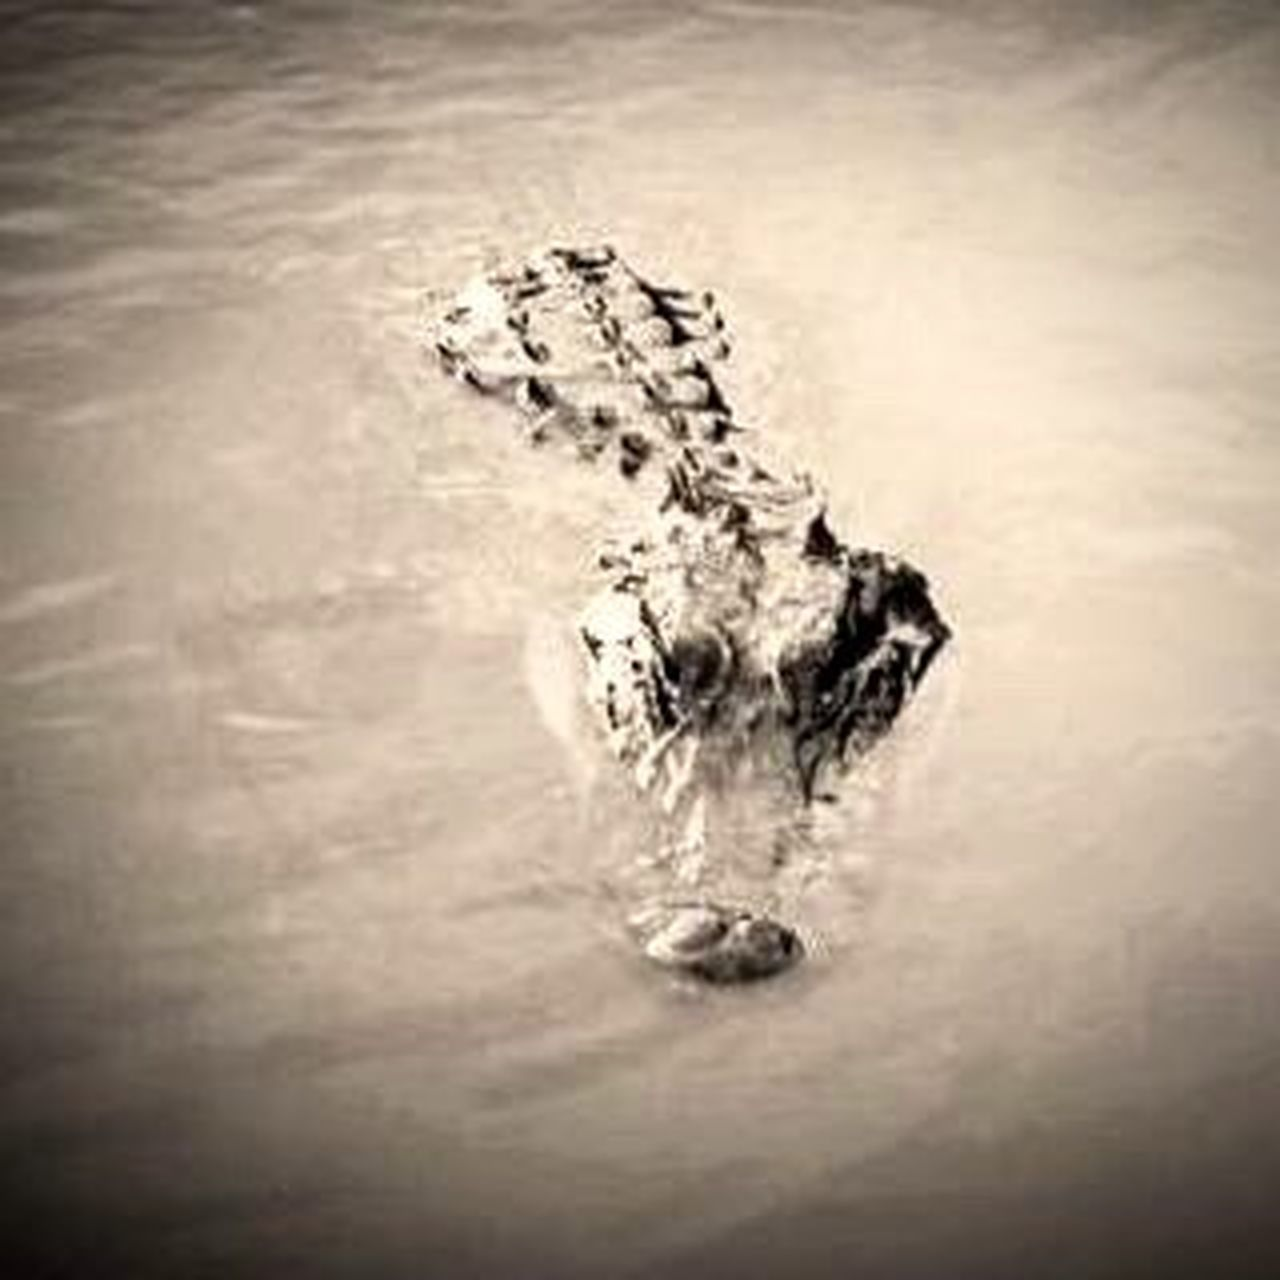 Curious. Boating Alligator Gator Lafitte Louisiana Nature Water Gentle Giant Animals Airboat Bayou Swamp Swamp Photos